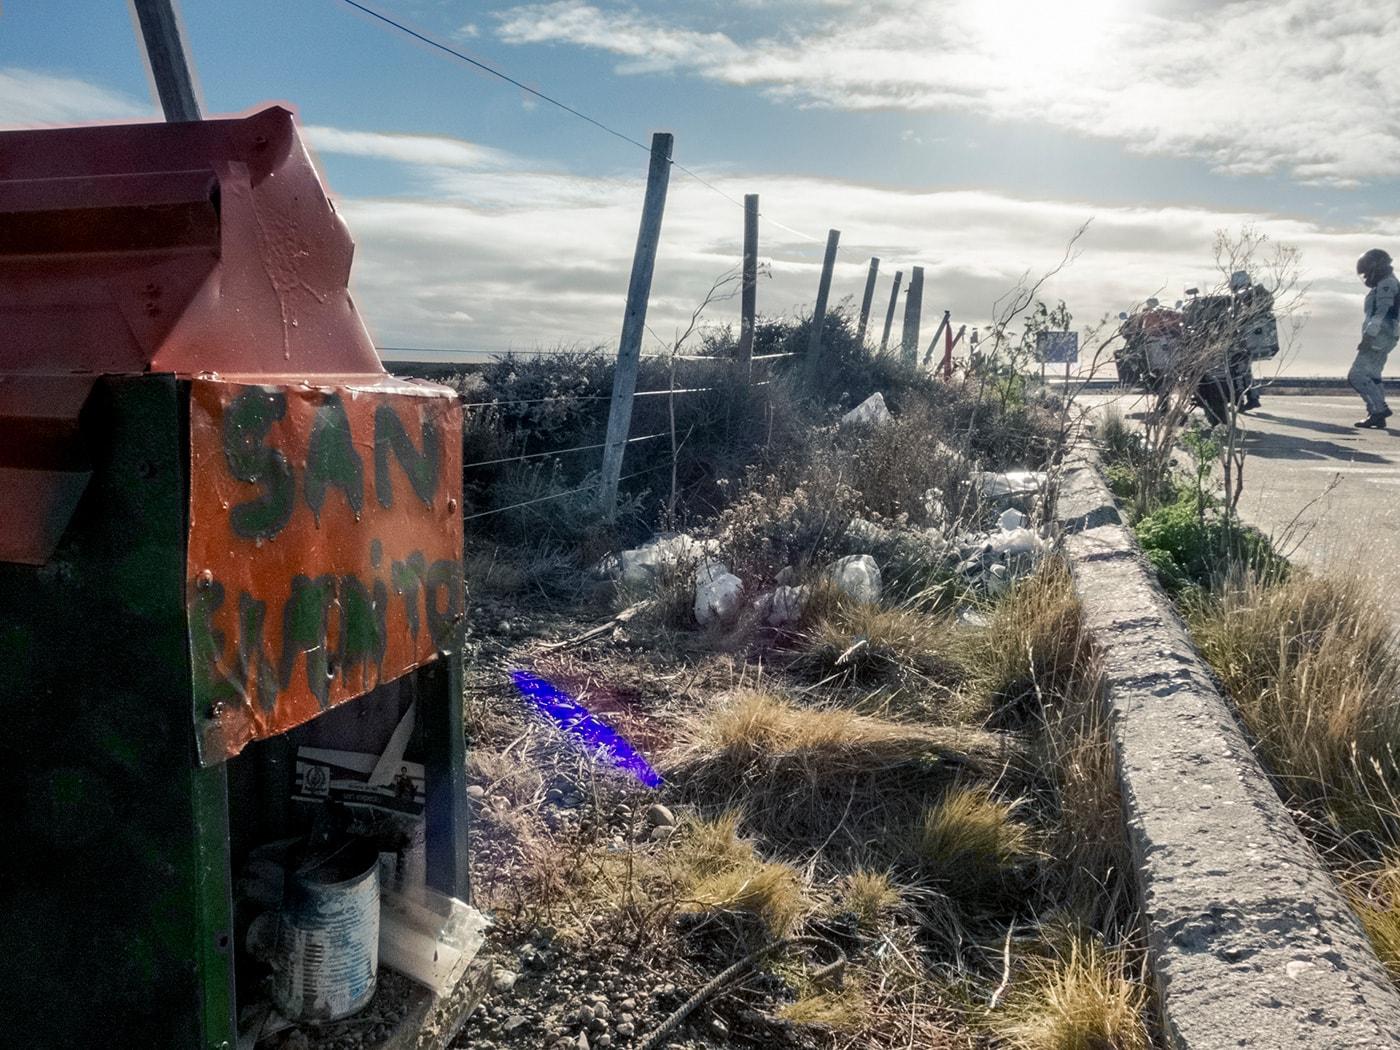 Capilla di san expedito in patagonia